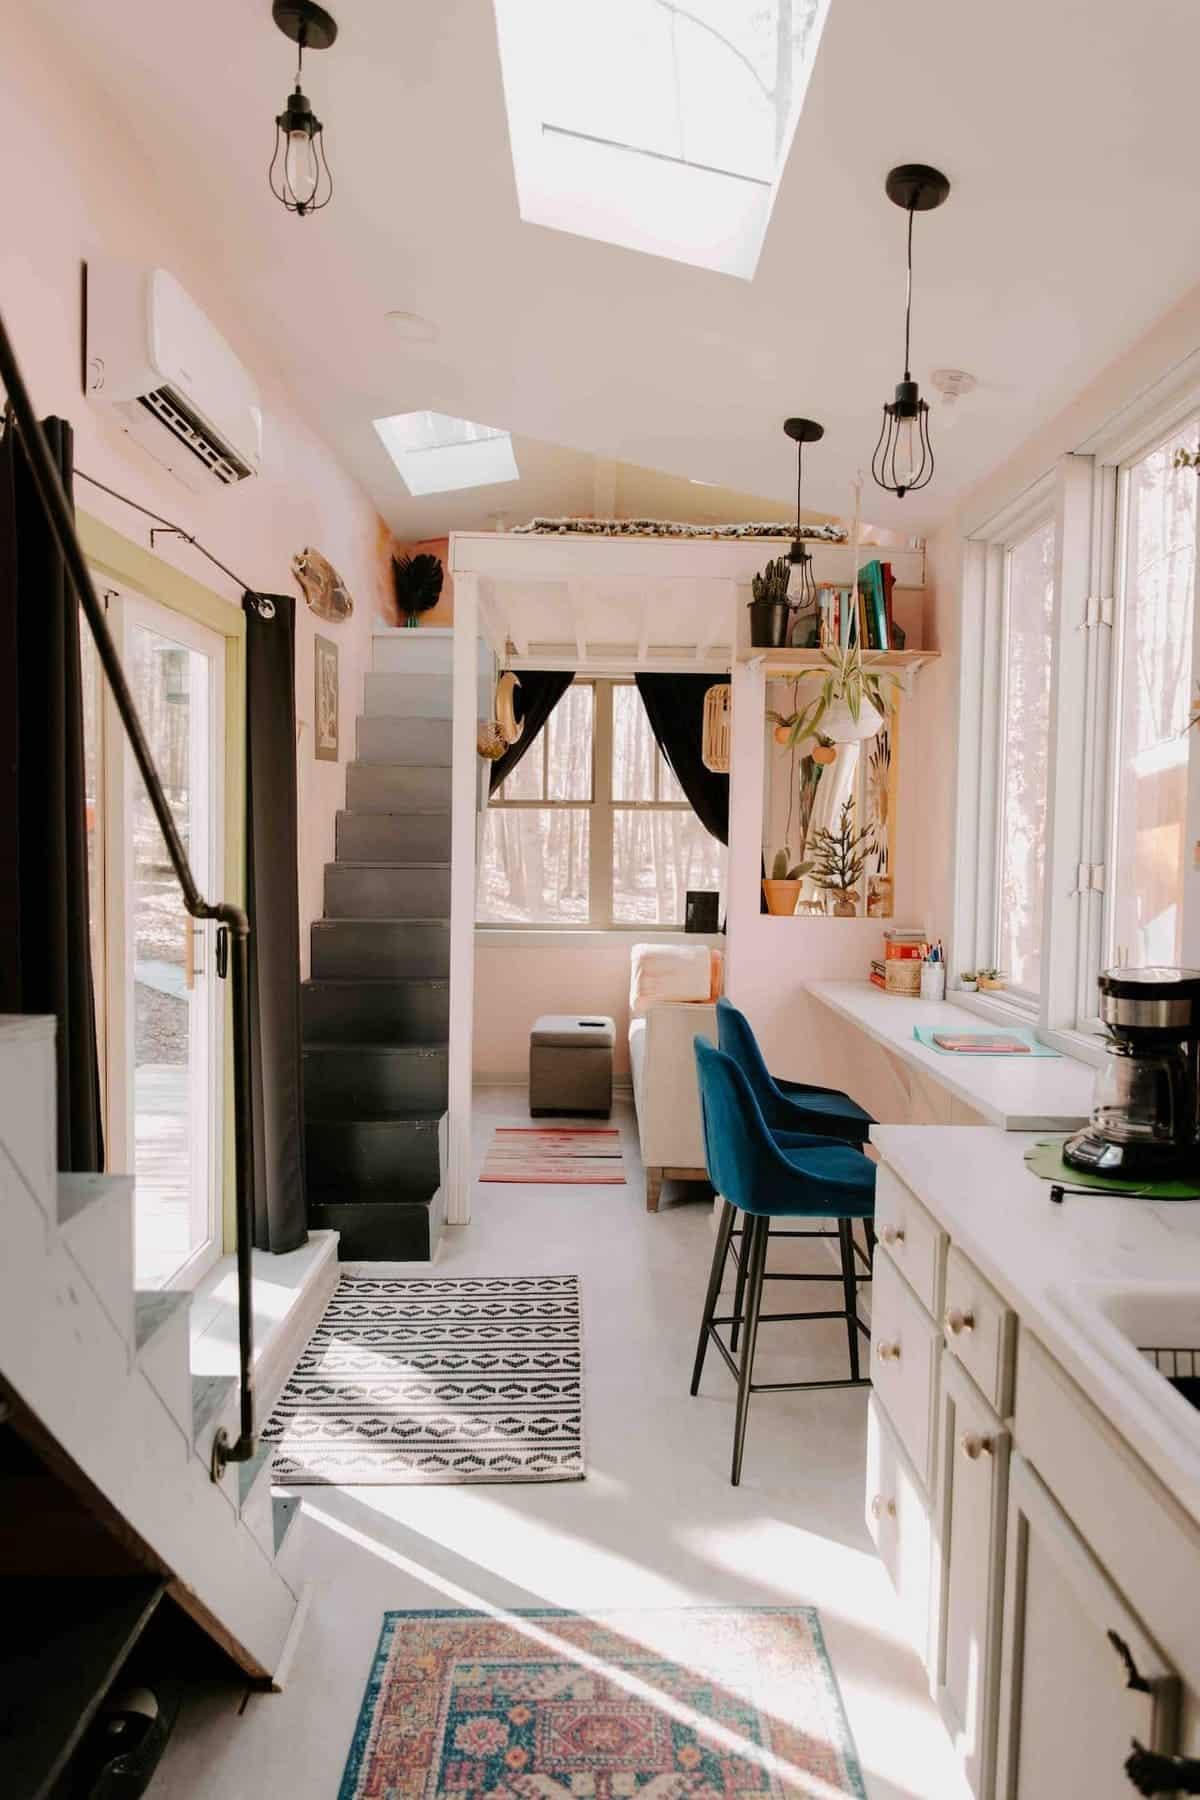 tiny house hola 16 - Tropical tiny house offers visitors a creative getaway